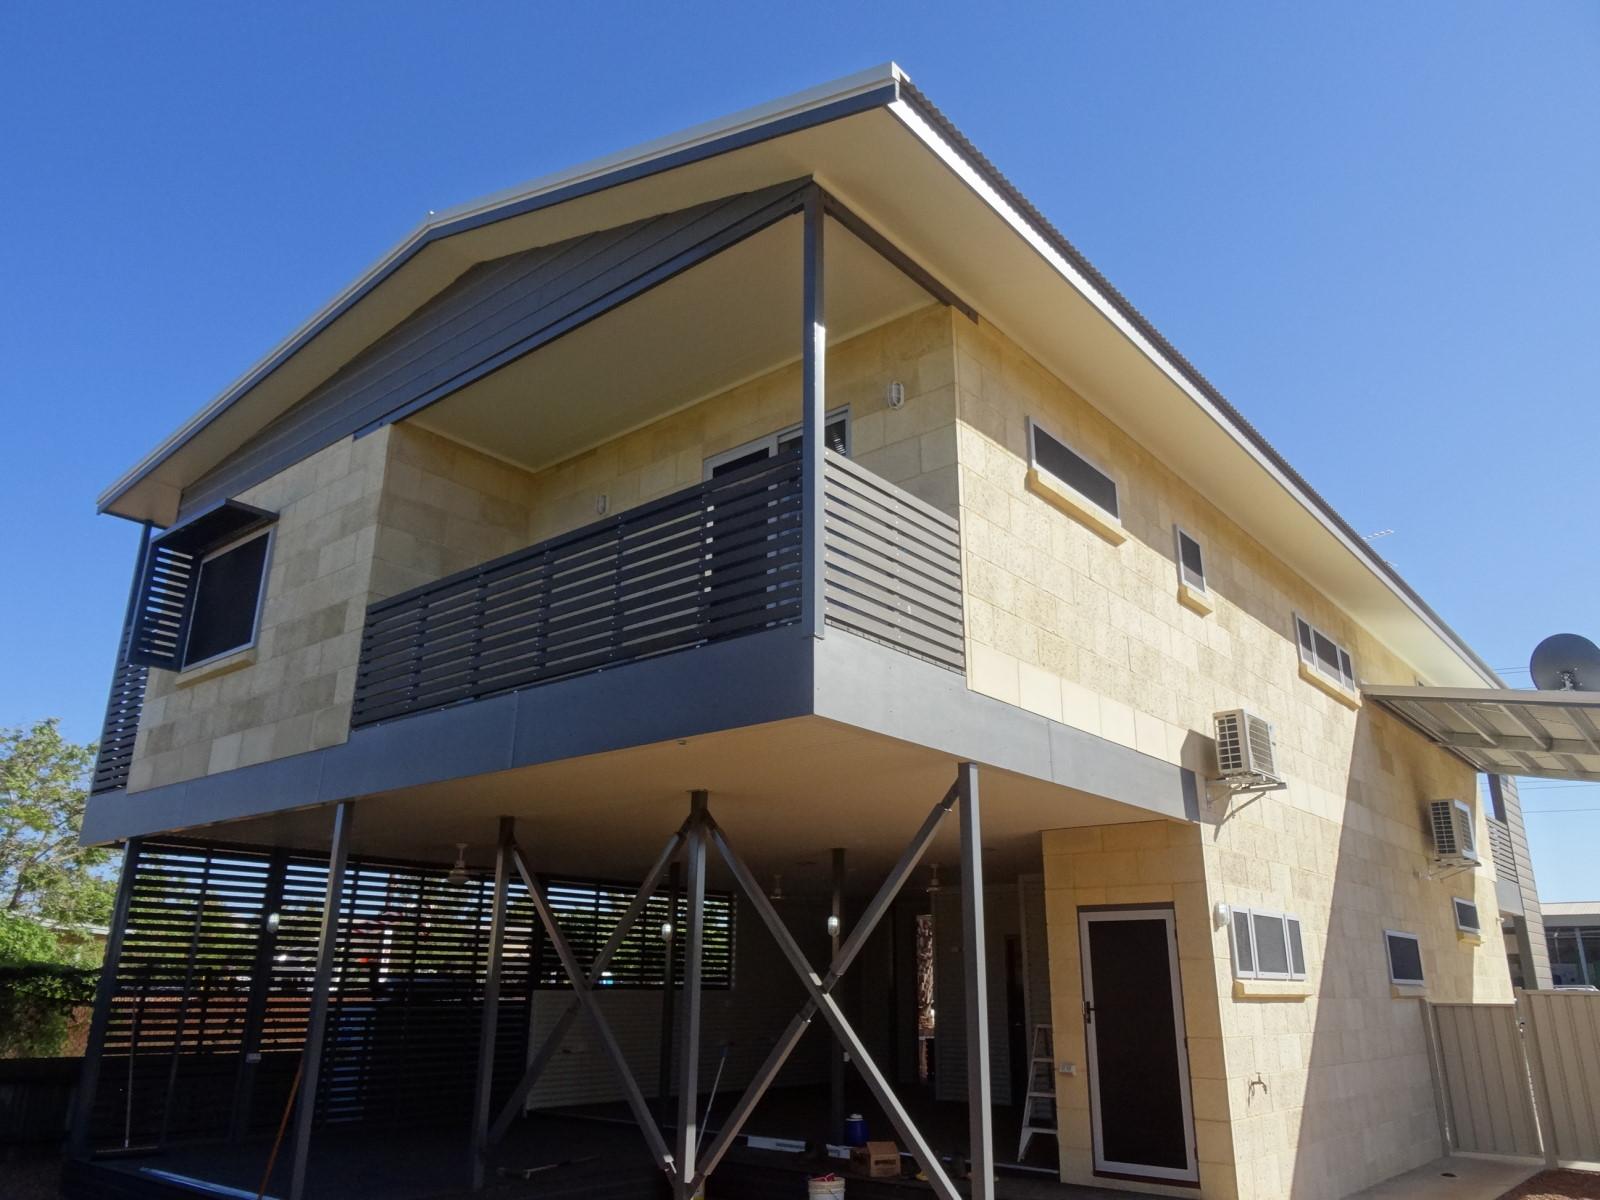 Inovation in Housing Award